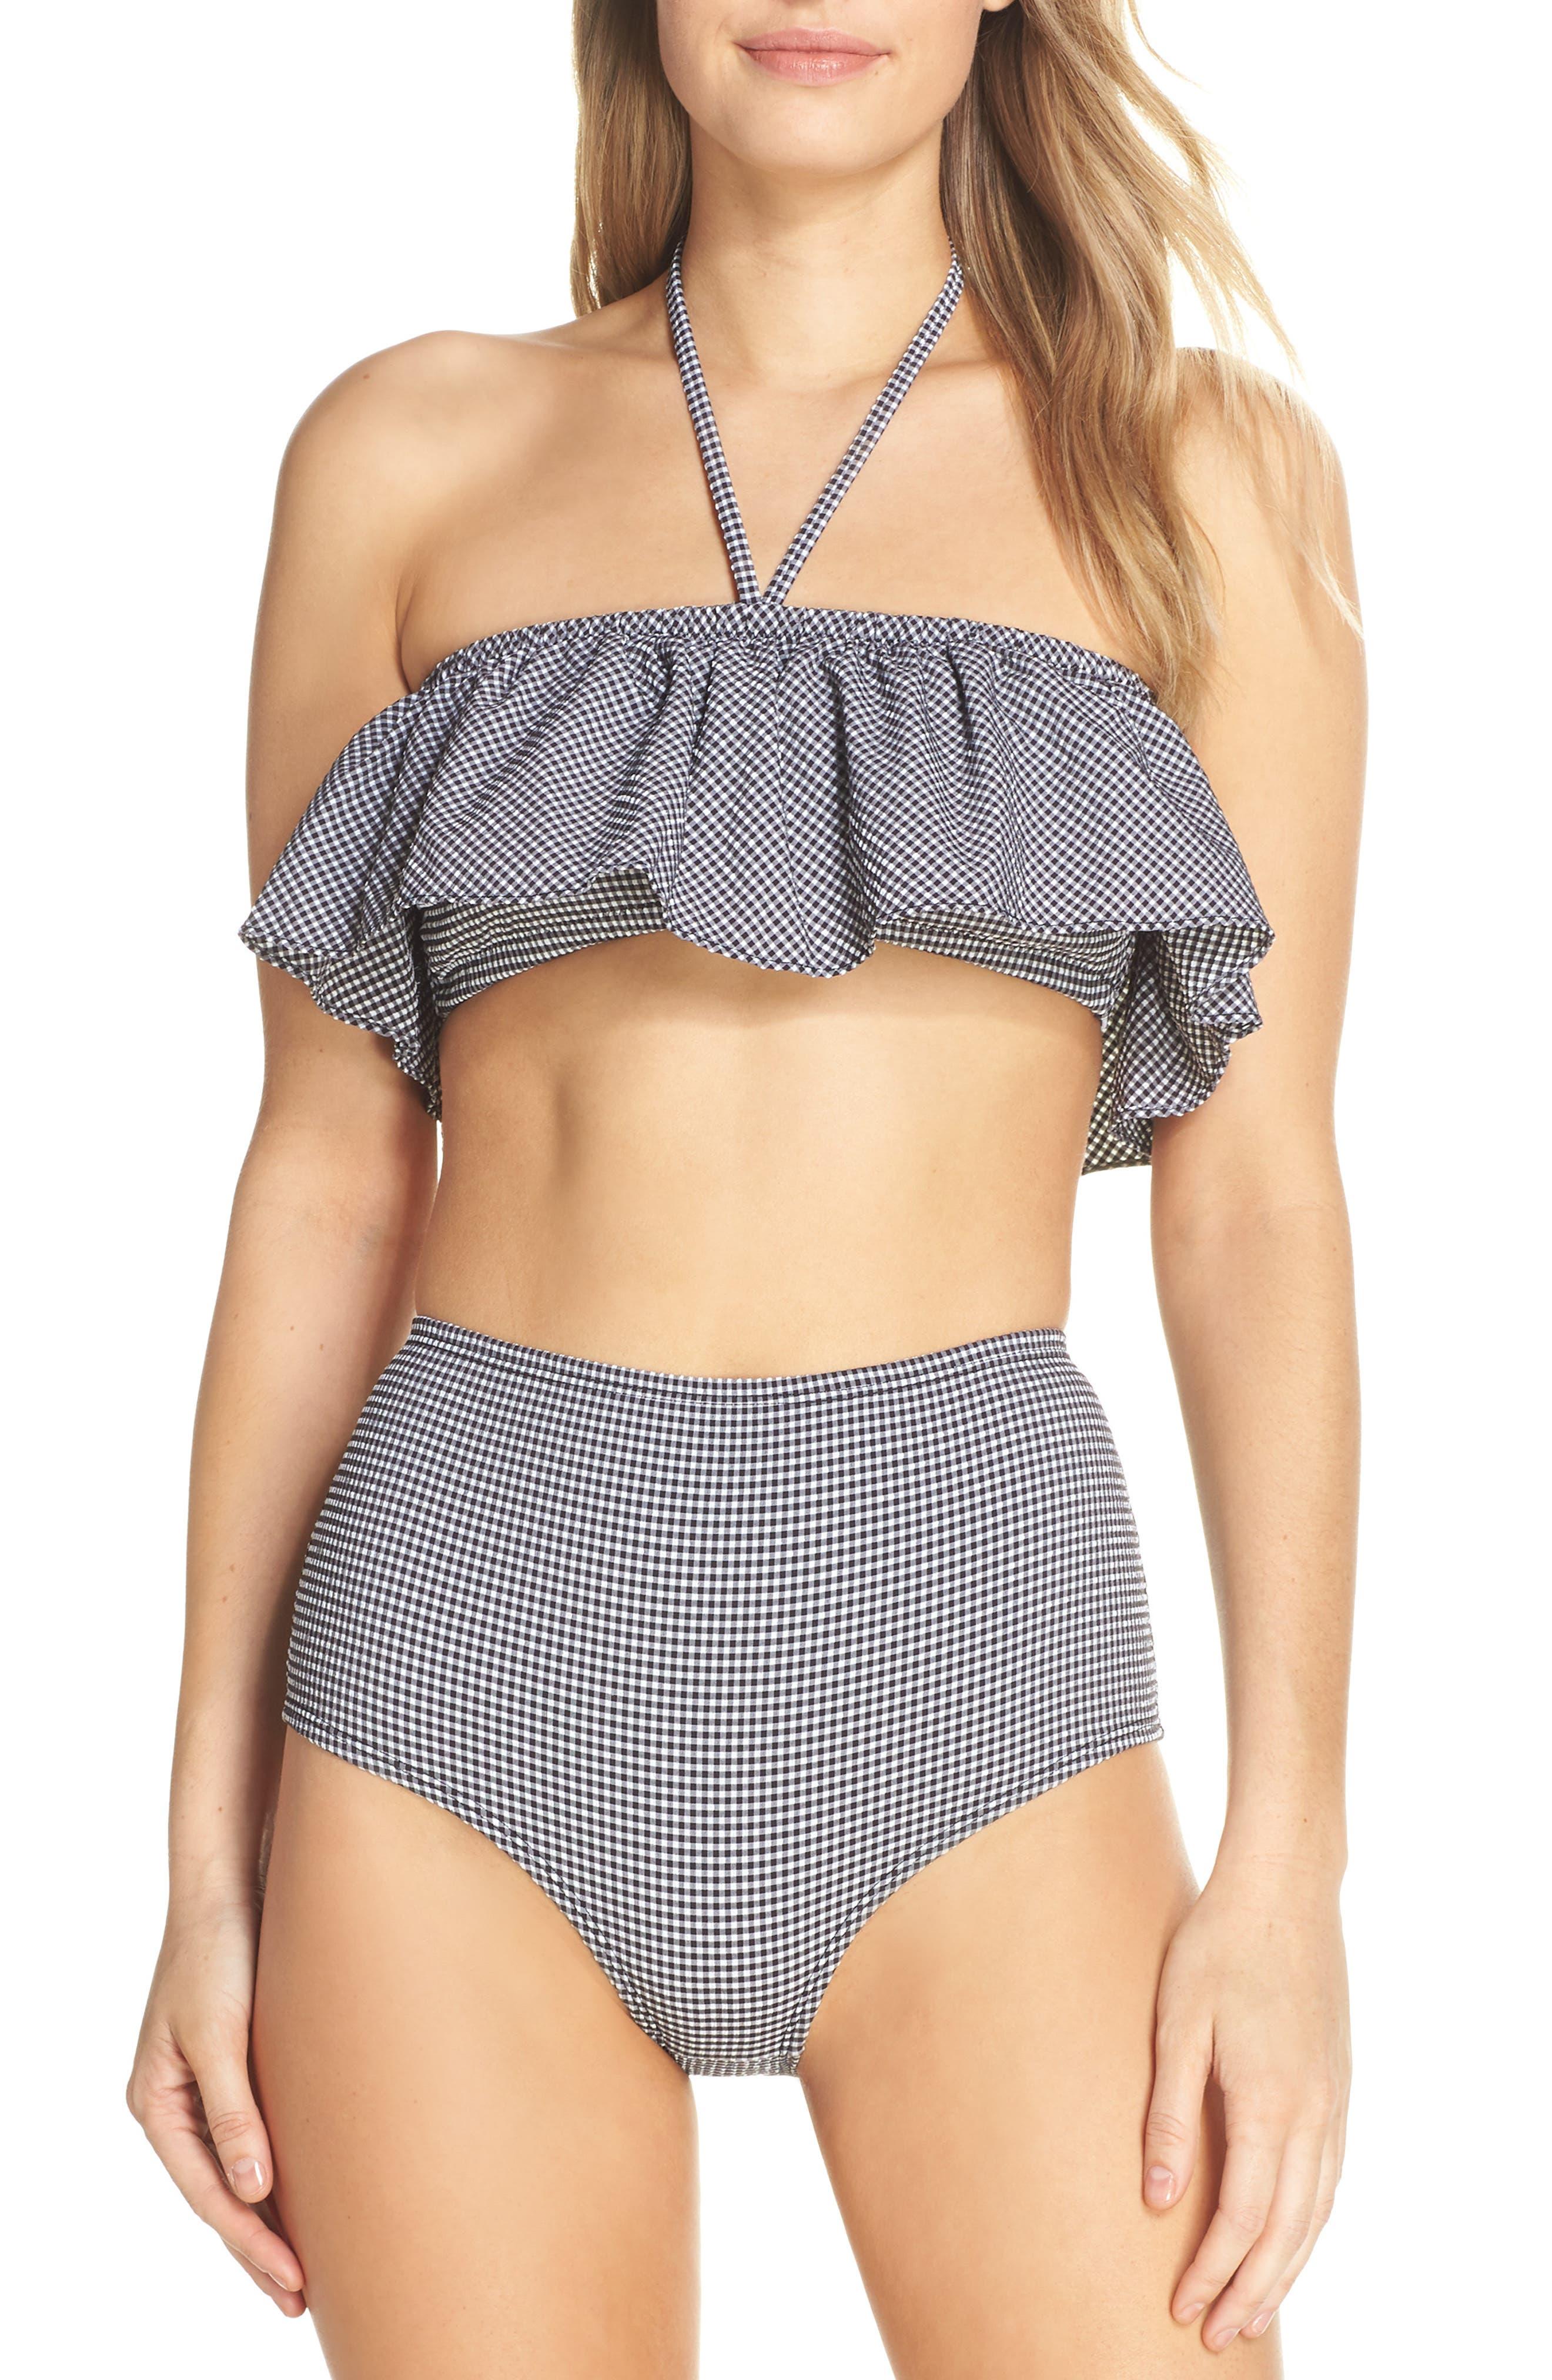 Ruffle Bandeau Bikini Top,                             Alternate thumbnail 8, color,                             003